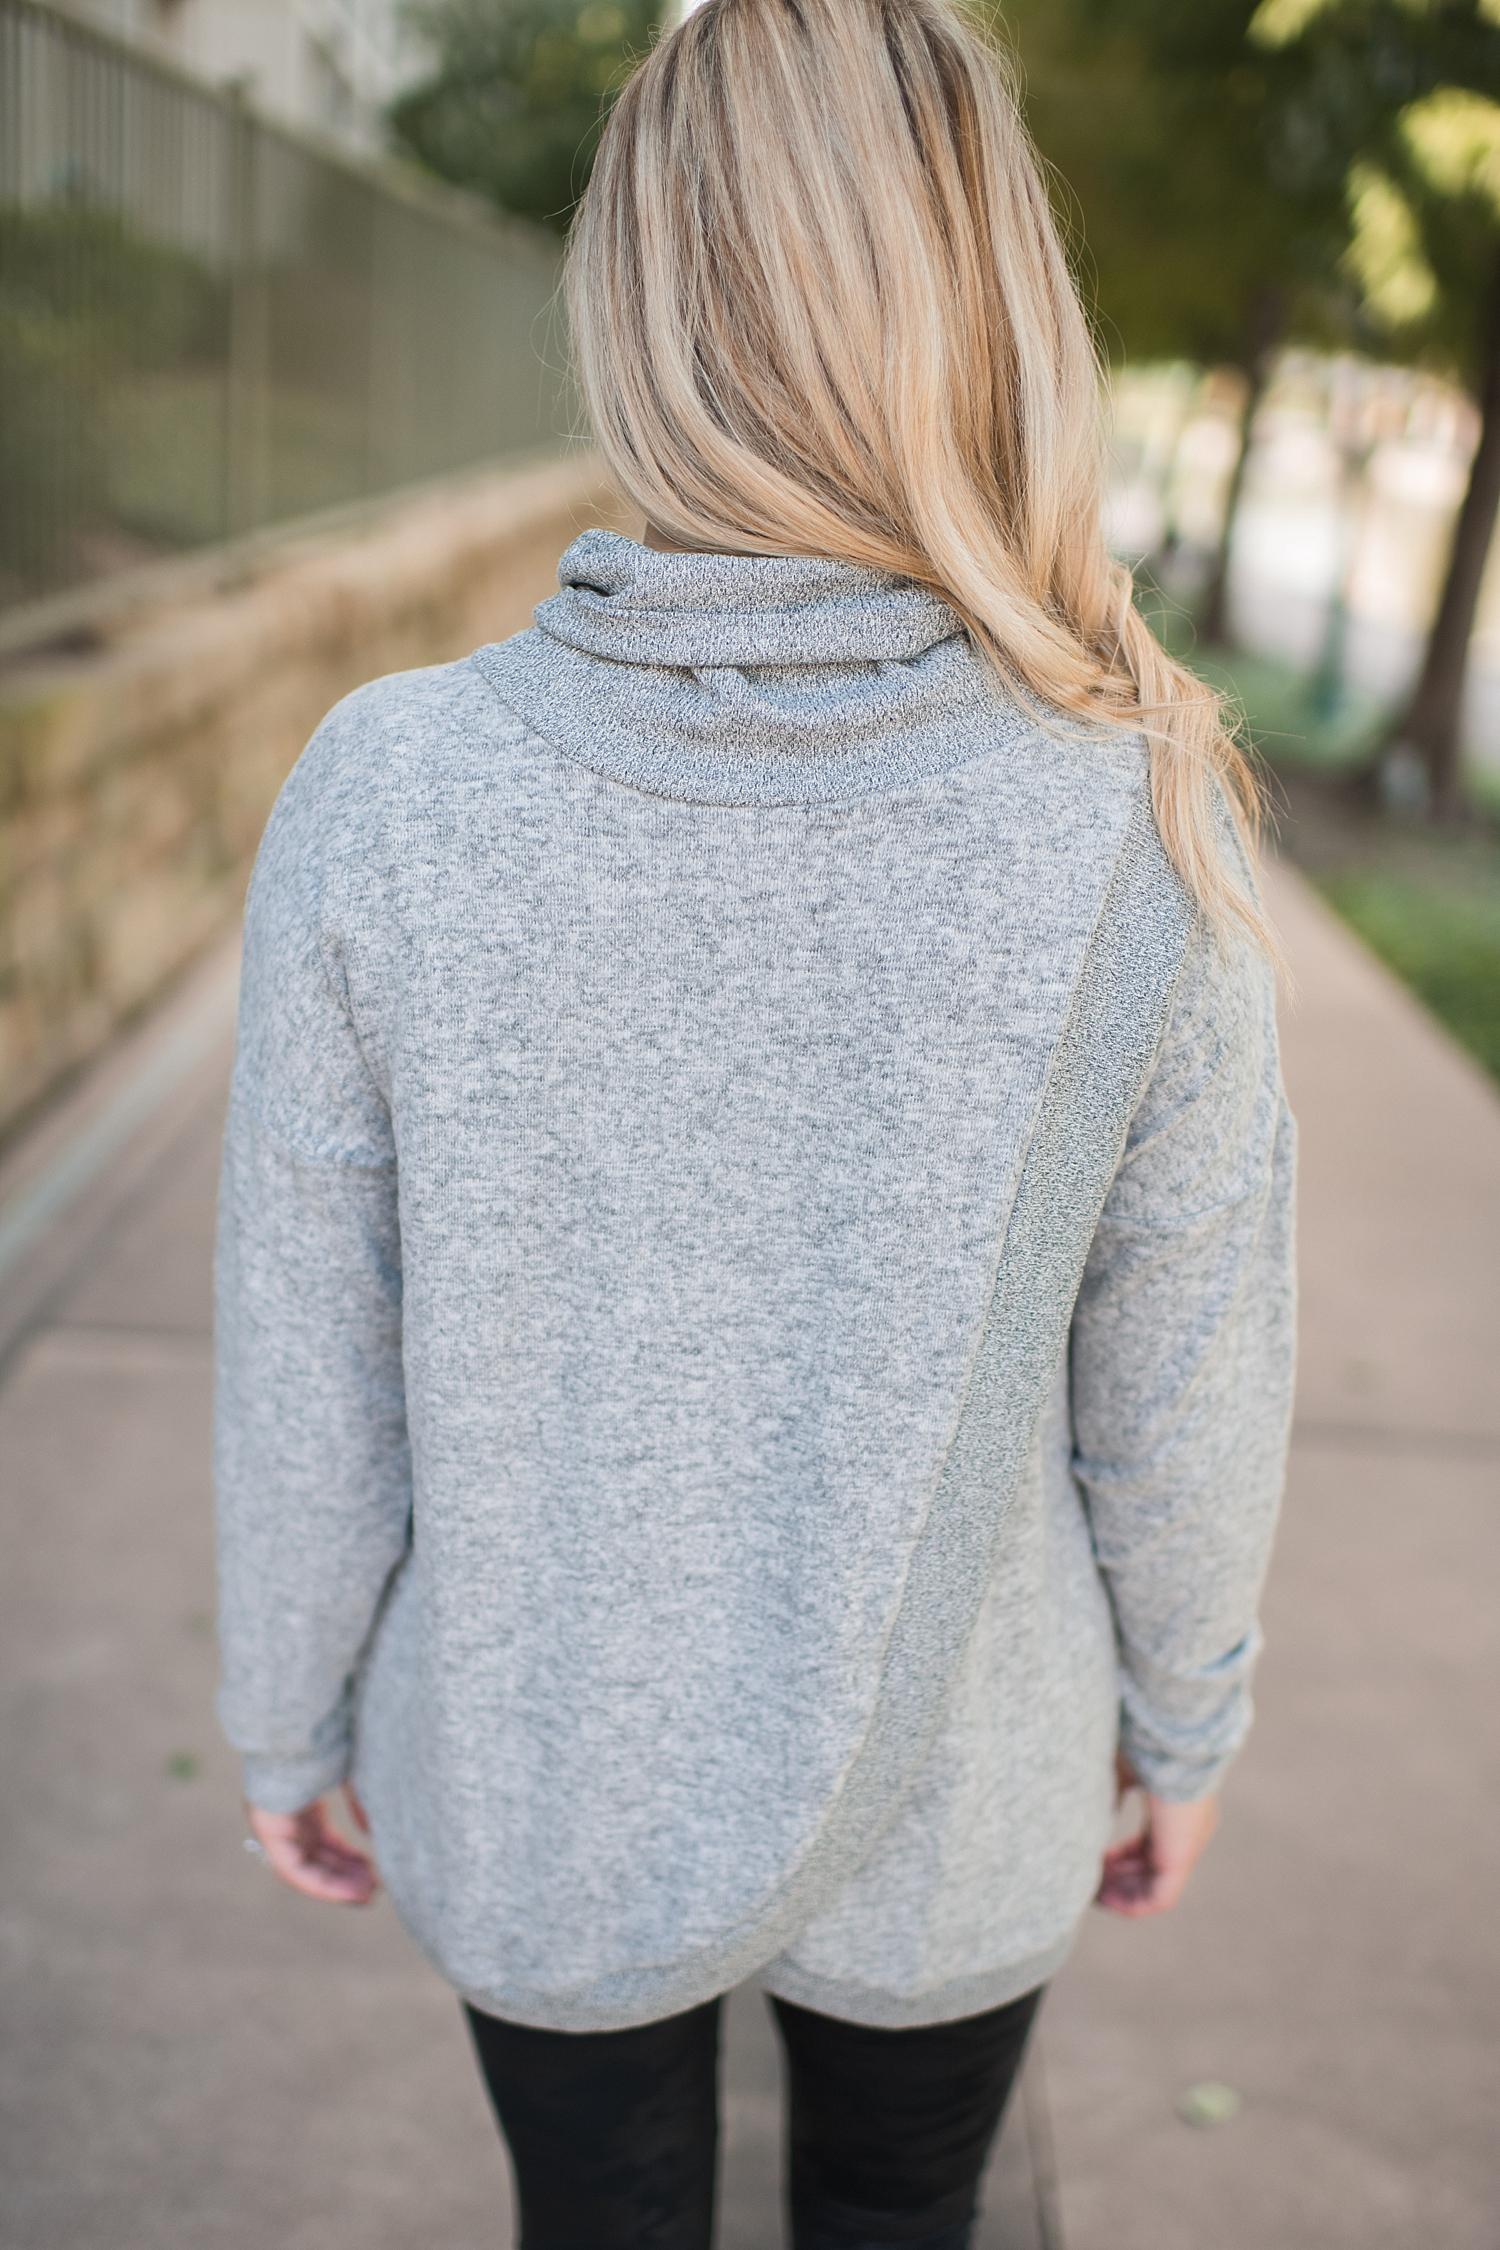 Nordstrom Turtleneck styled by top Houston fashion blog, Fancy Ashley